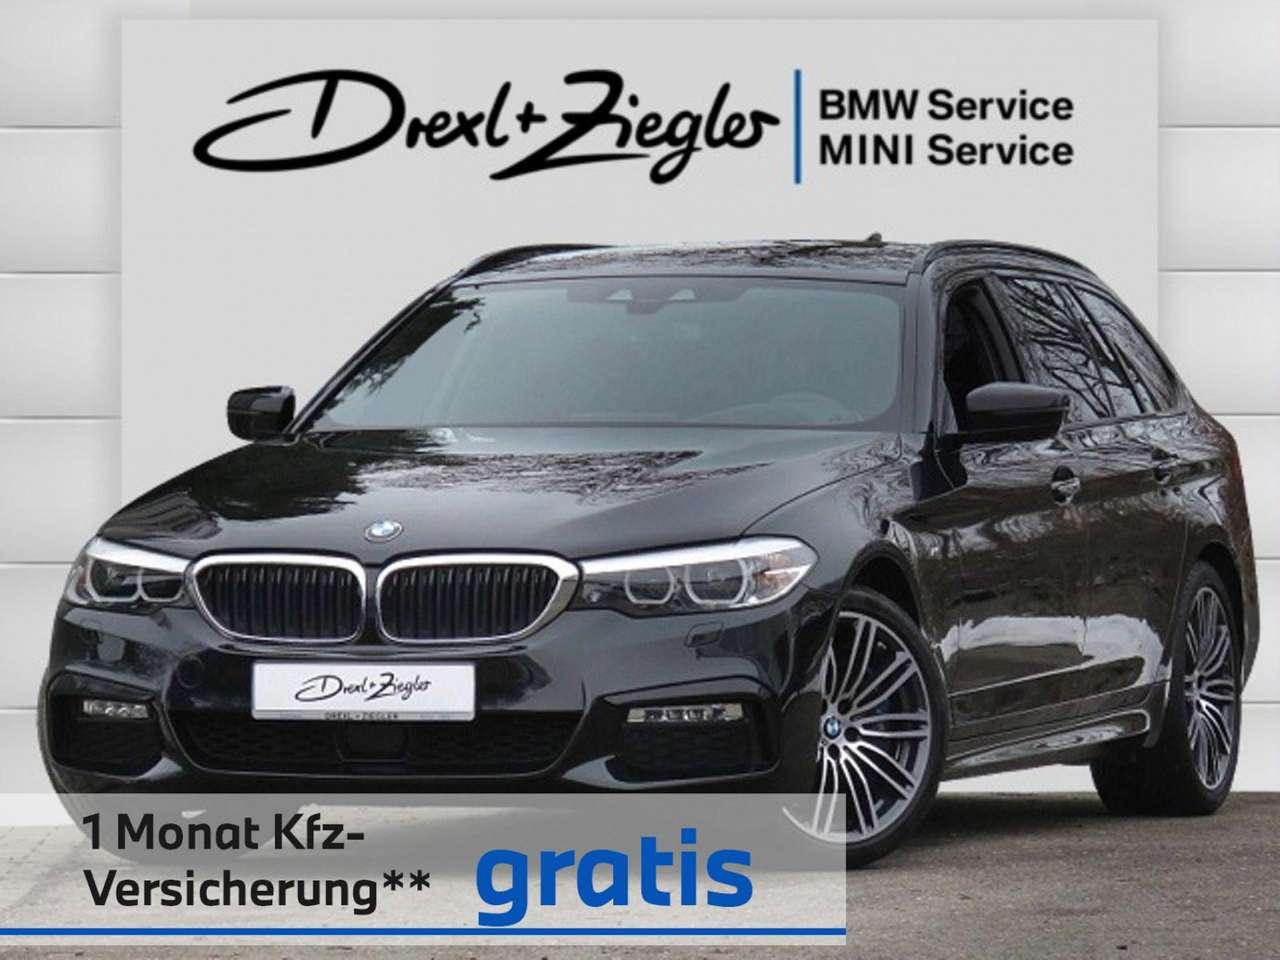 Autos nach BMW 5-Series 540i Touring xDrive